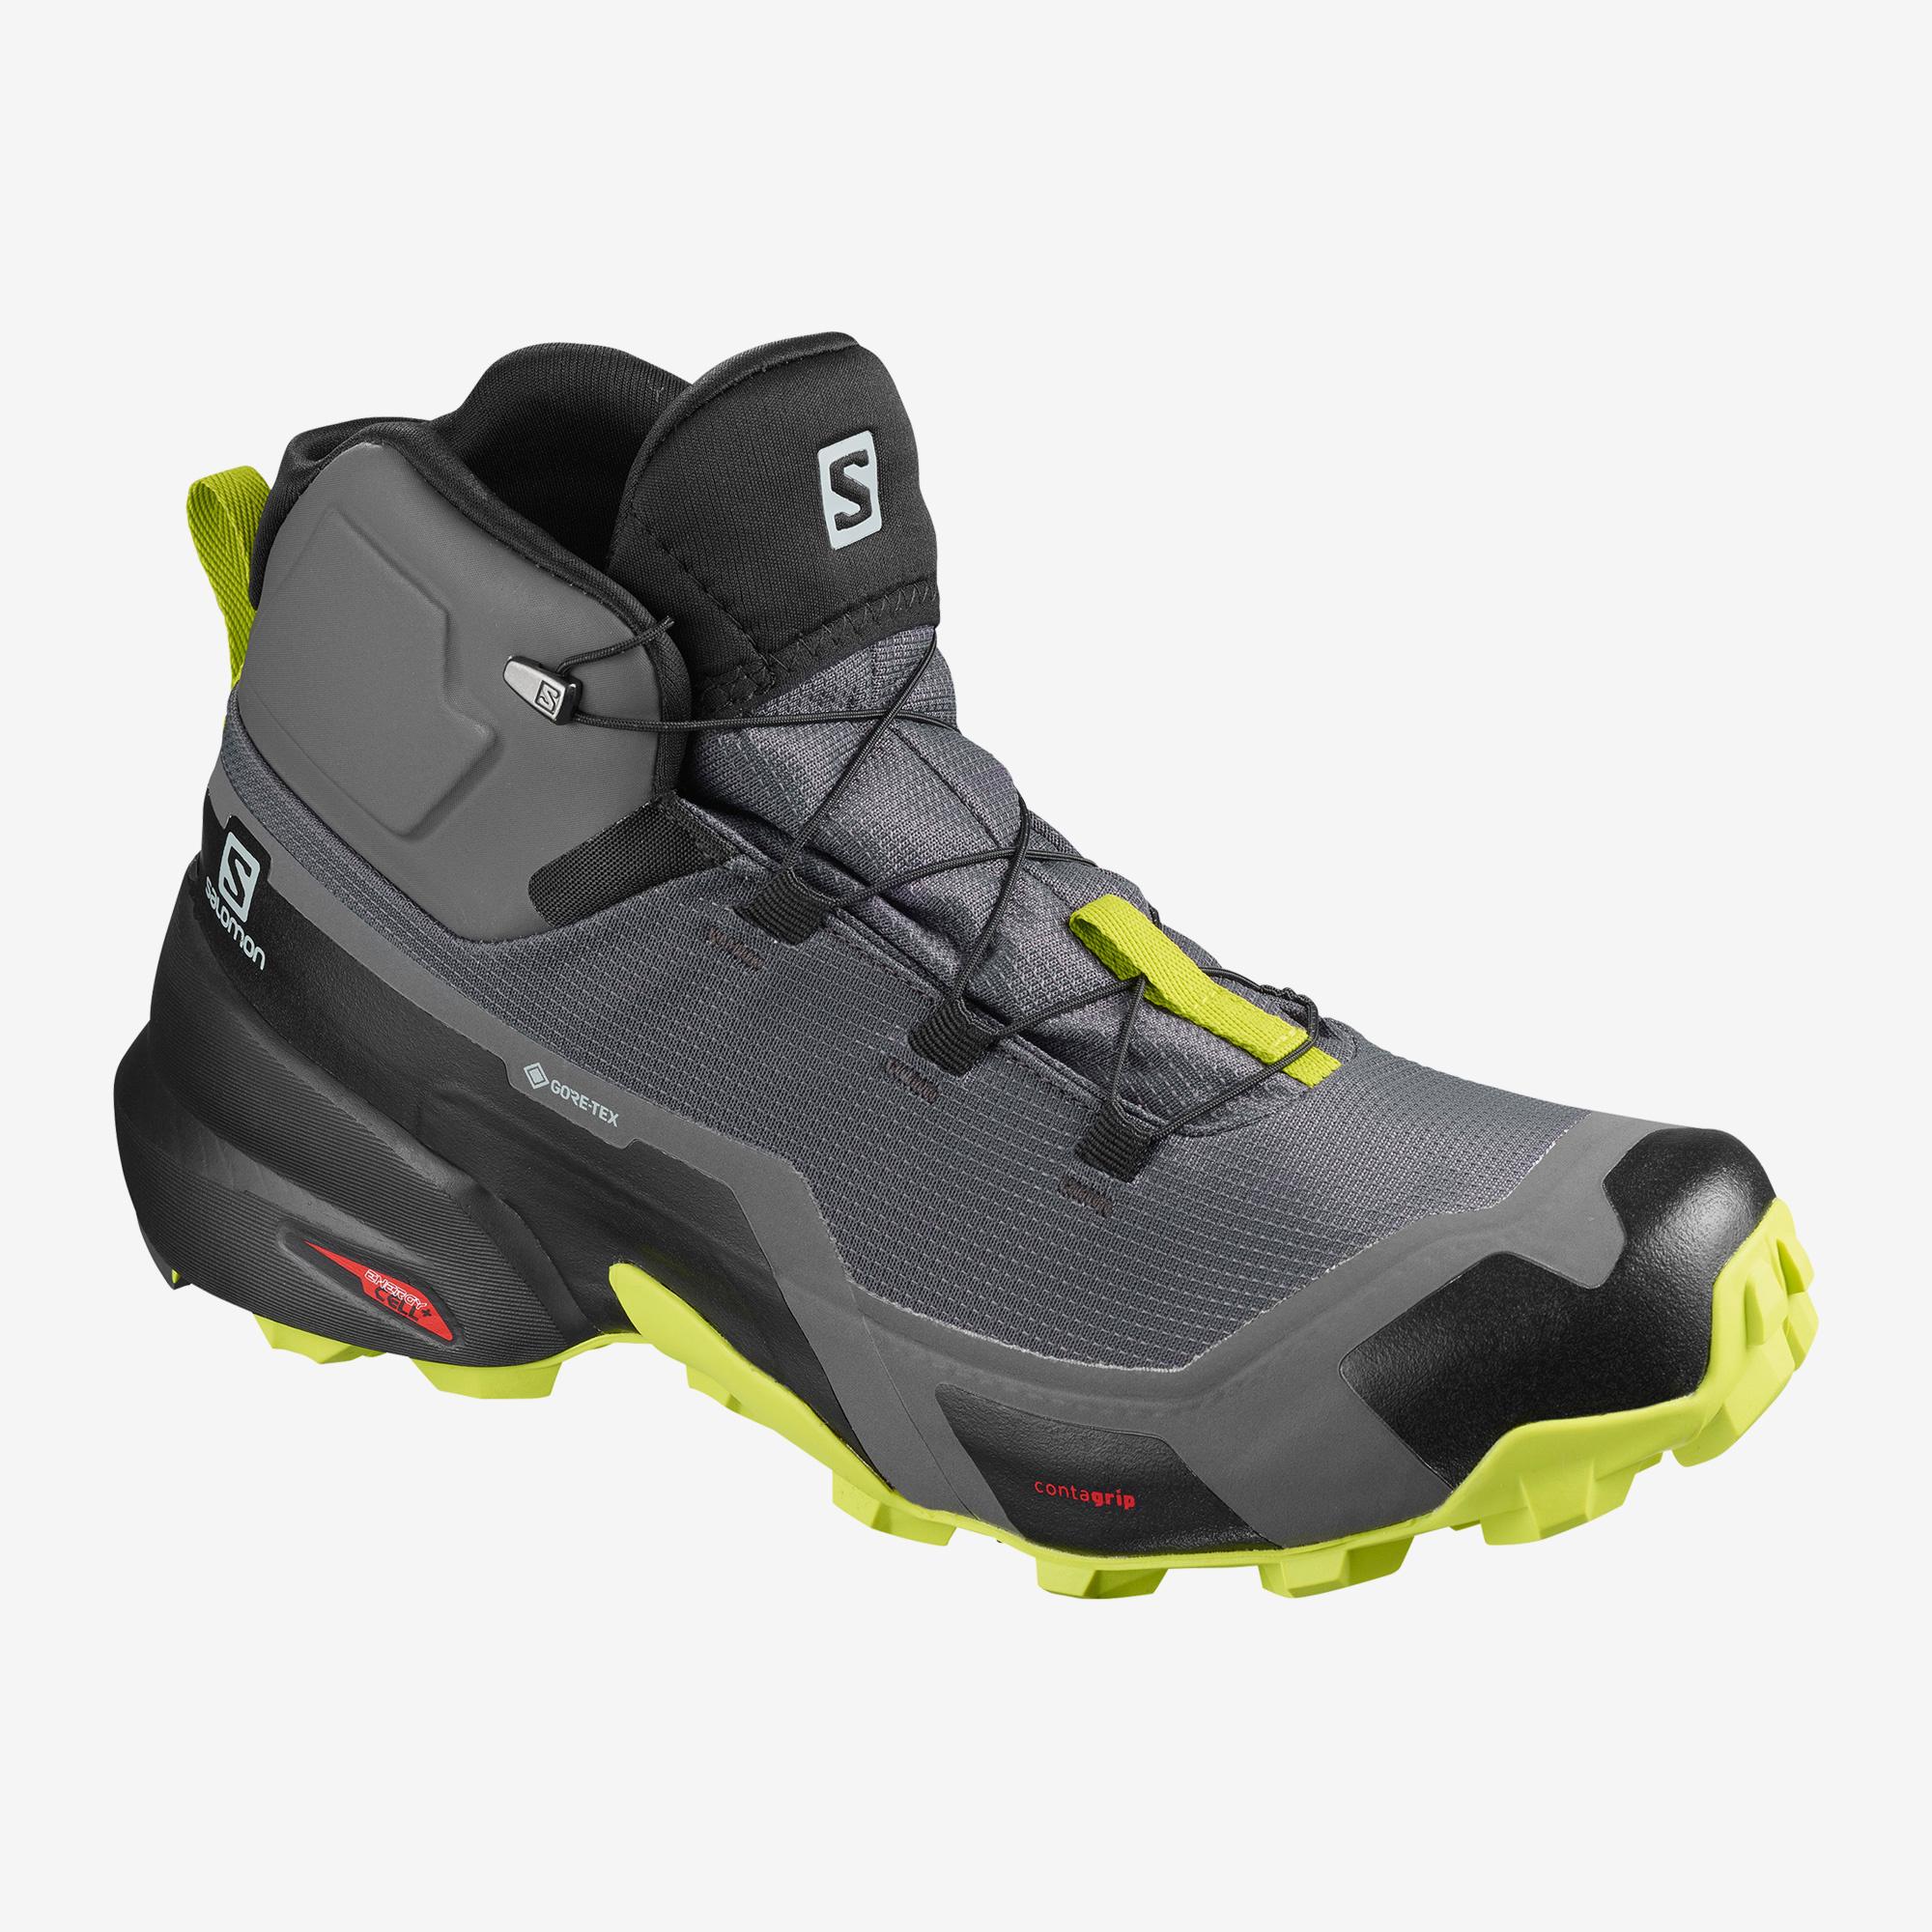 Salomon Cross Hike Mid GTX Men's Hiking Boot